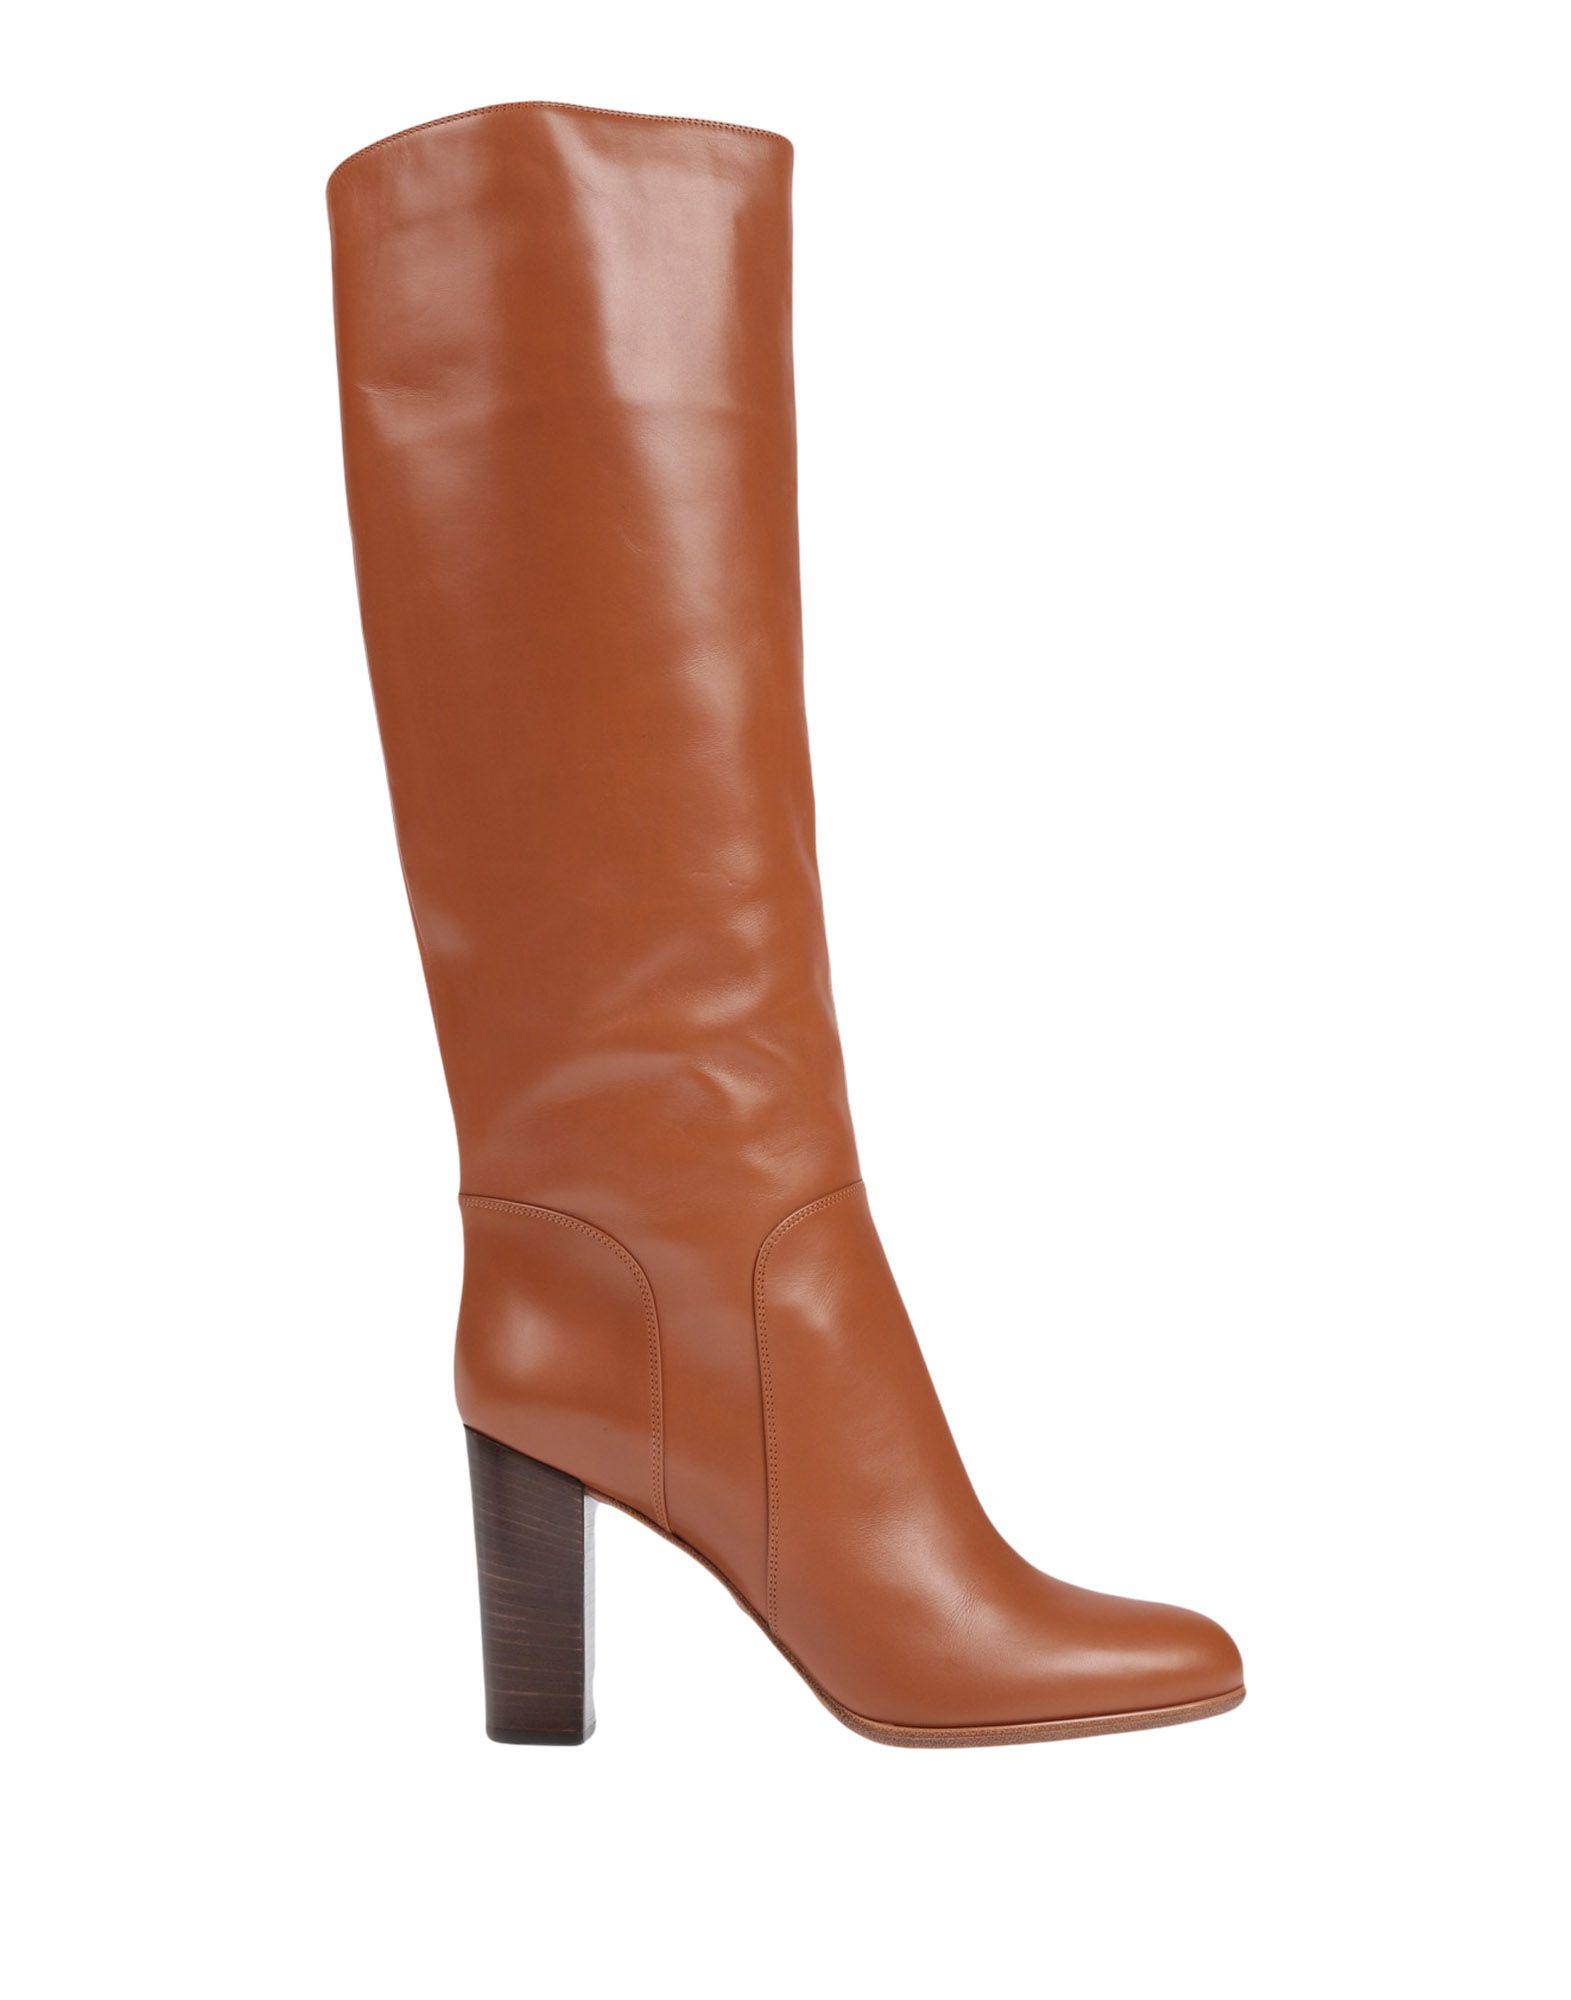 Sergio Rossi Rossi Boots - Women Sergio Rossi Rossi Boots online on  United Kingdom - 11528092LM e255ab